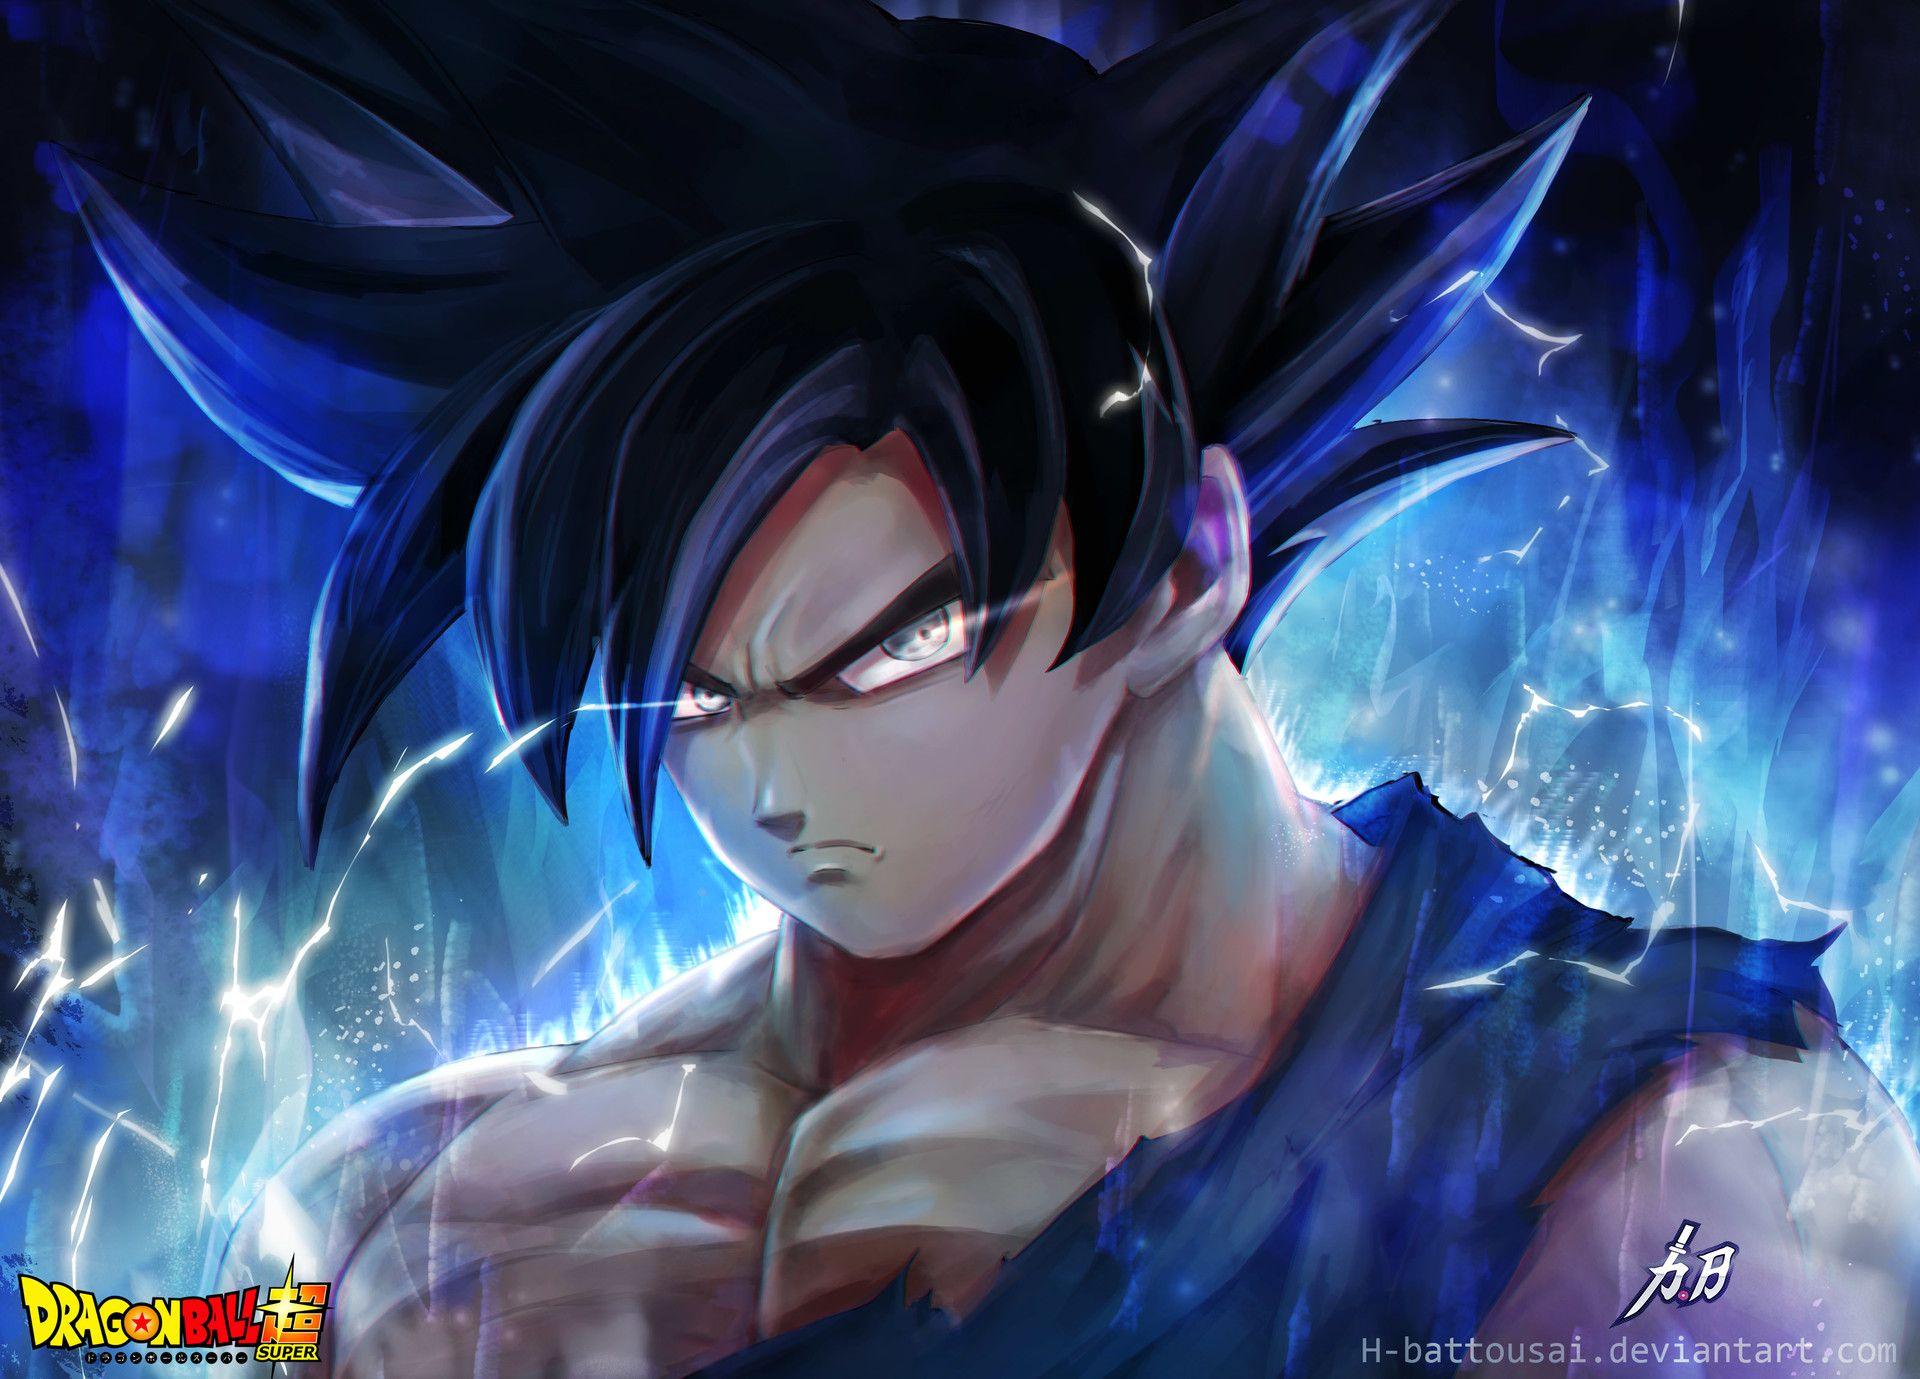 Fan Art Goku With New Form Power Awesome Anime Dragon Ball Dragon Ball Super Goku Dragon Ball Art